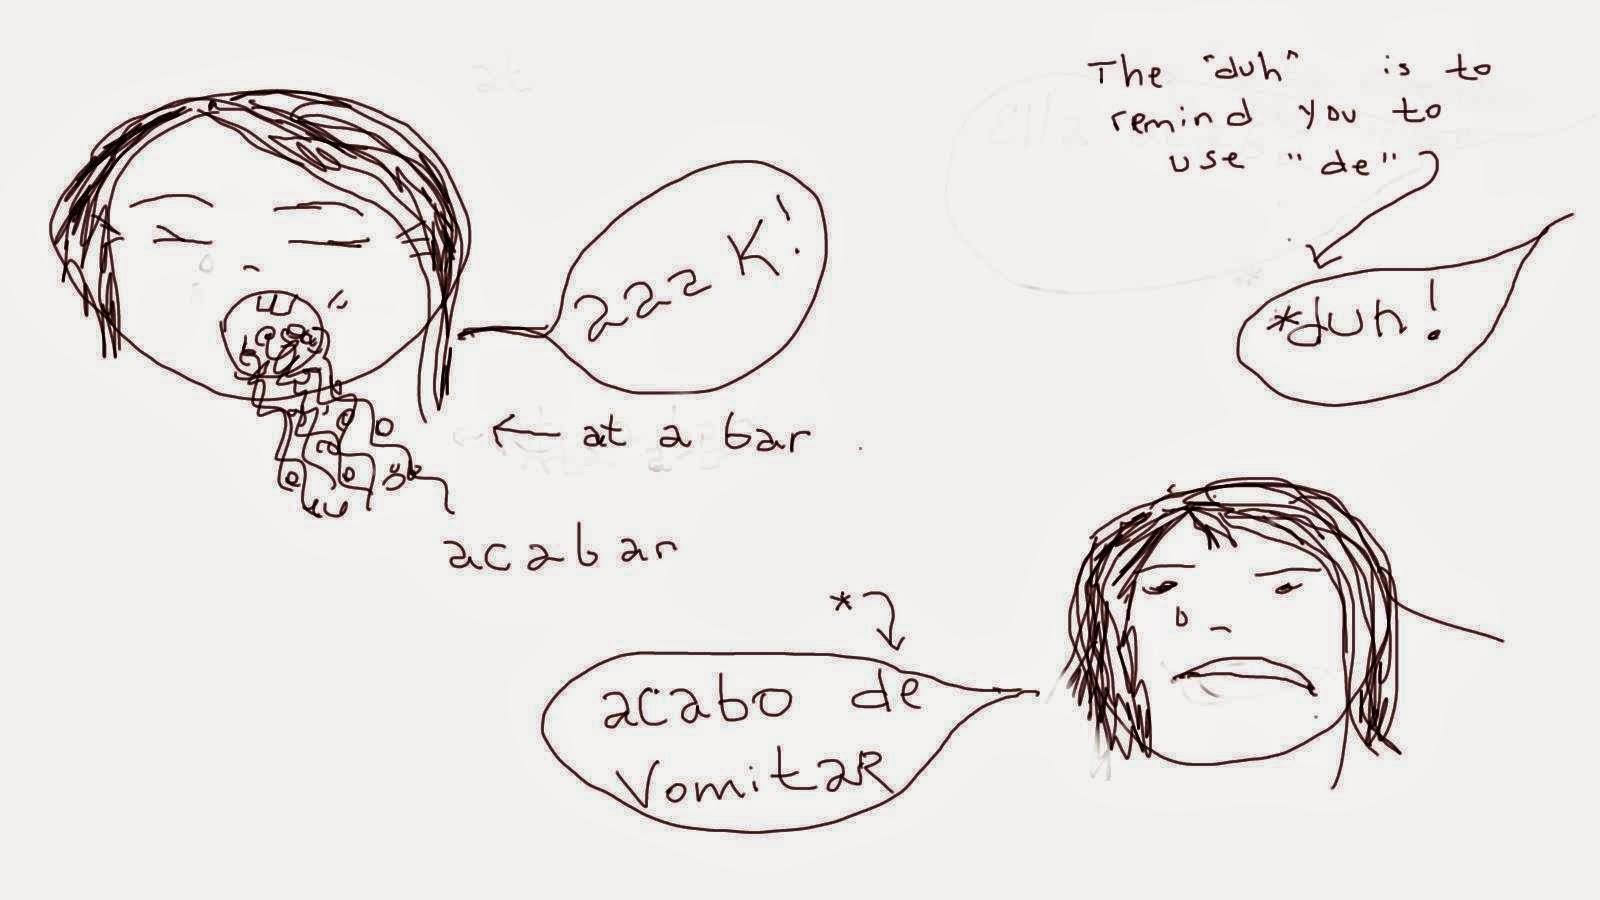 Acabar de infinitive verb